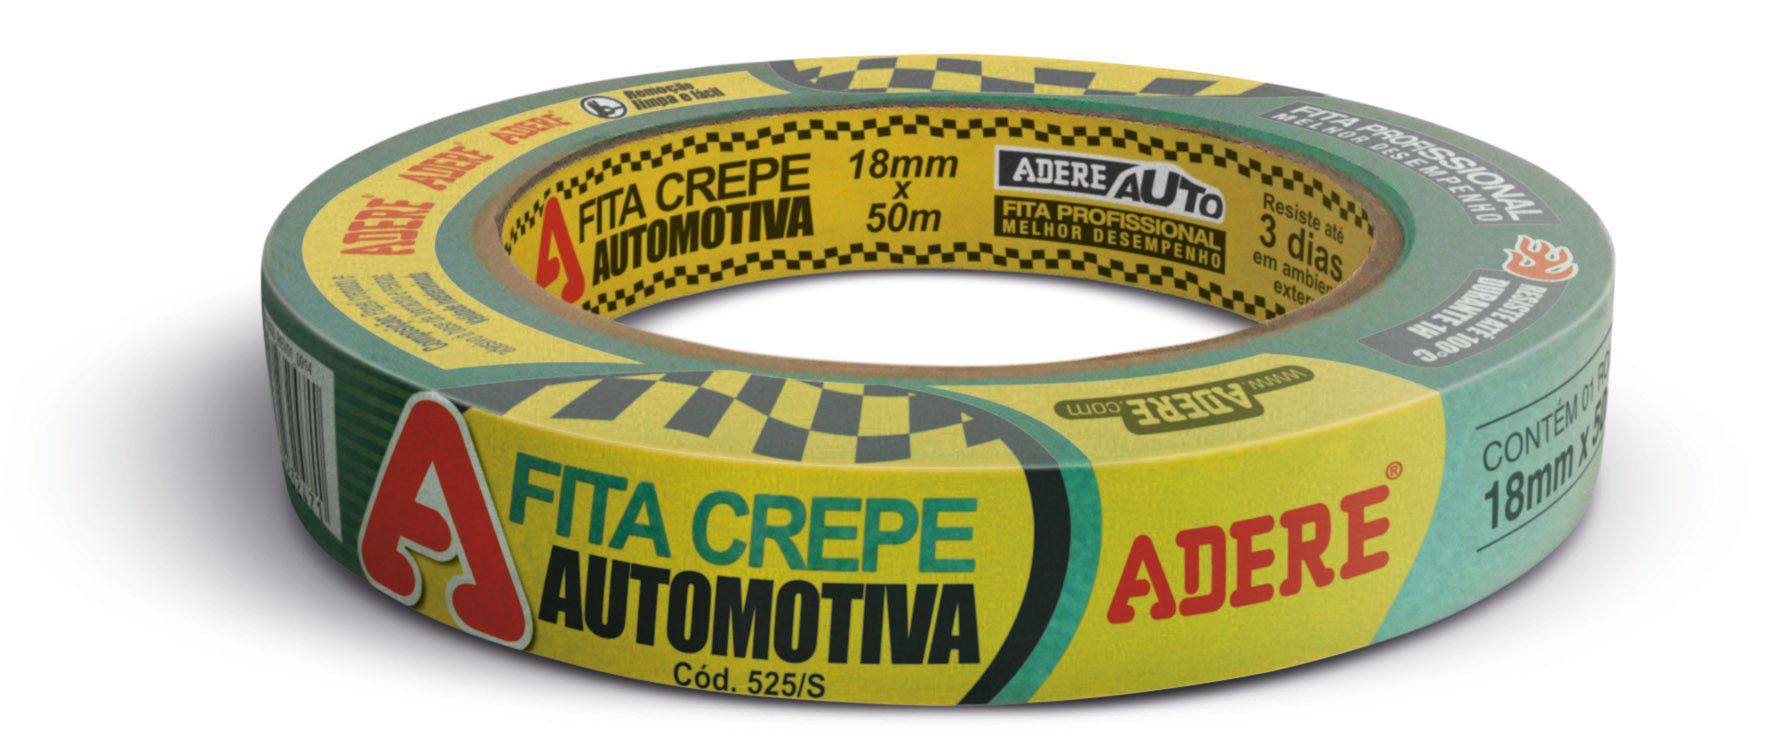 FITA CREPE AUTOMOTIVA VERDE 18MMX50MM ADERE